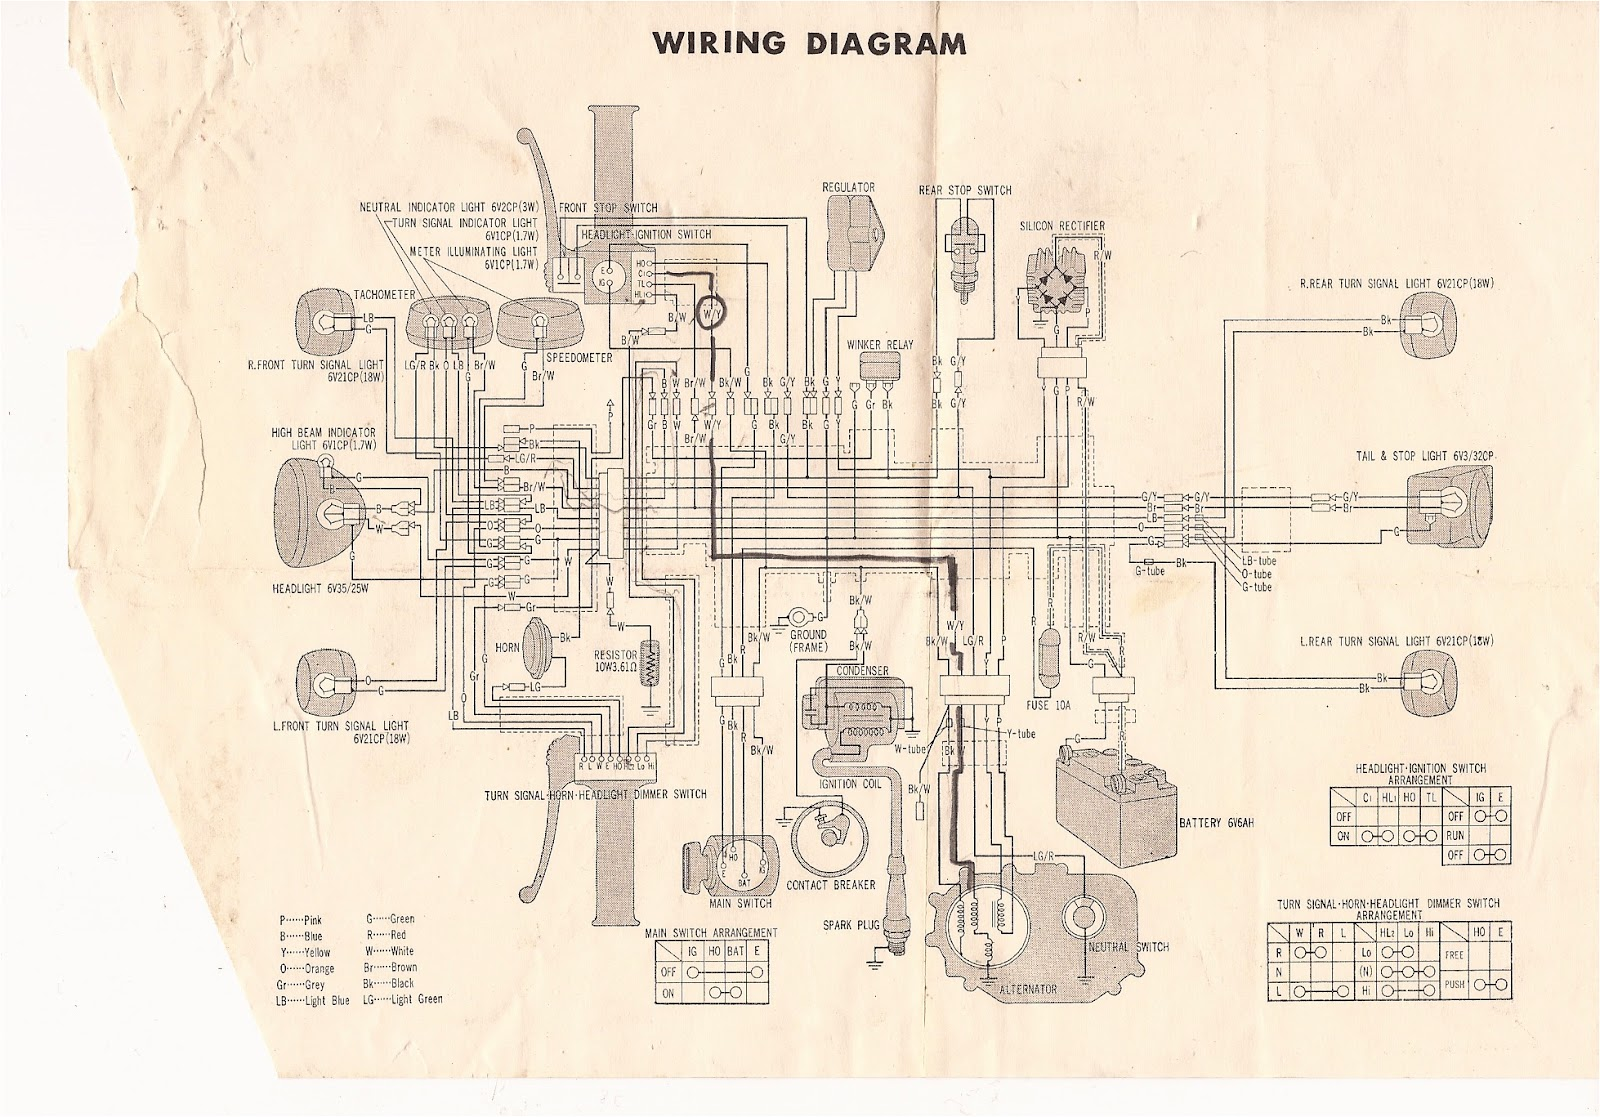 cb450 wire diagram dodge grand caravan hitch wiring, Wiring diagram